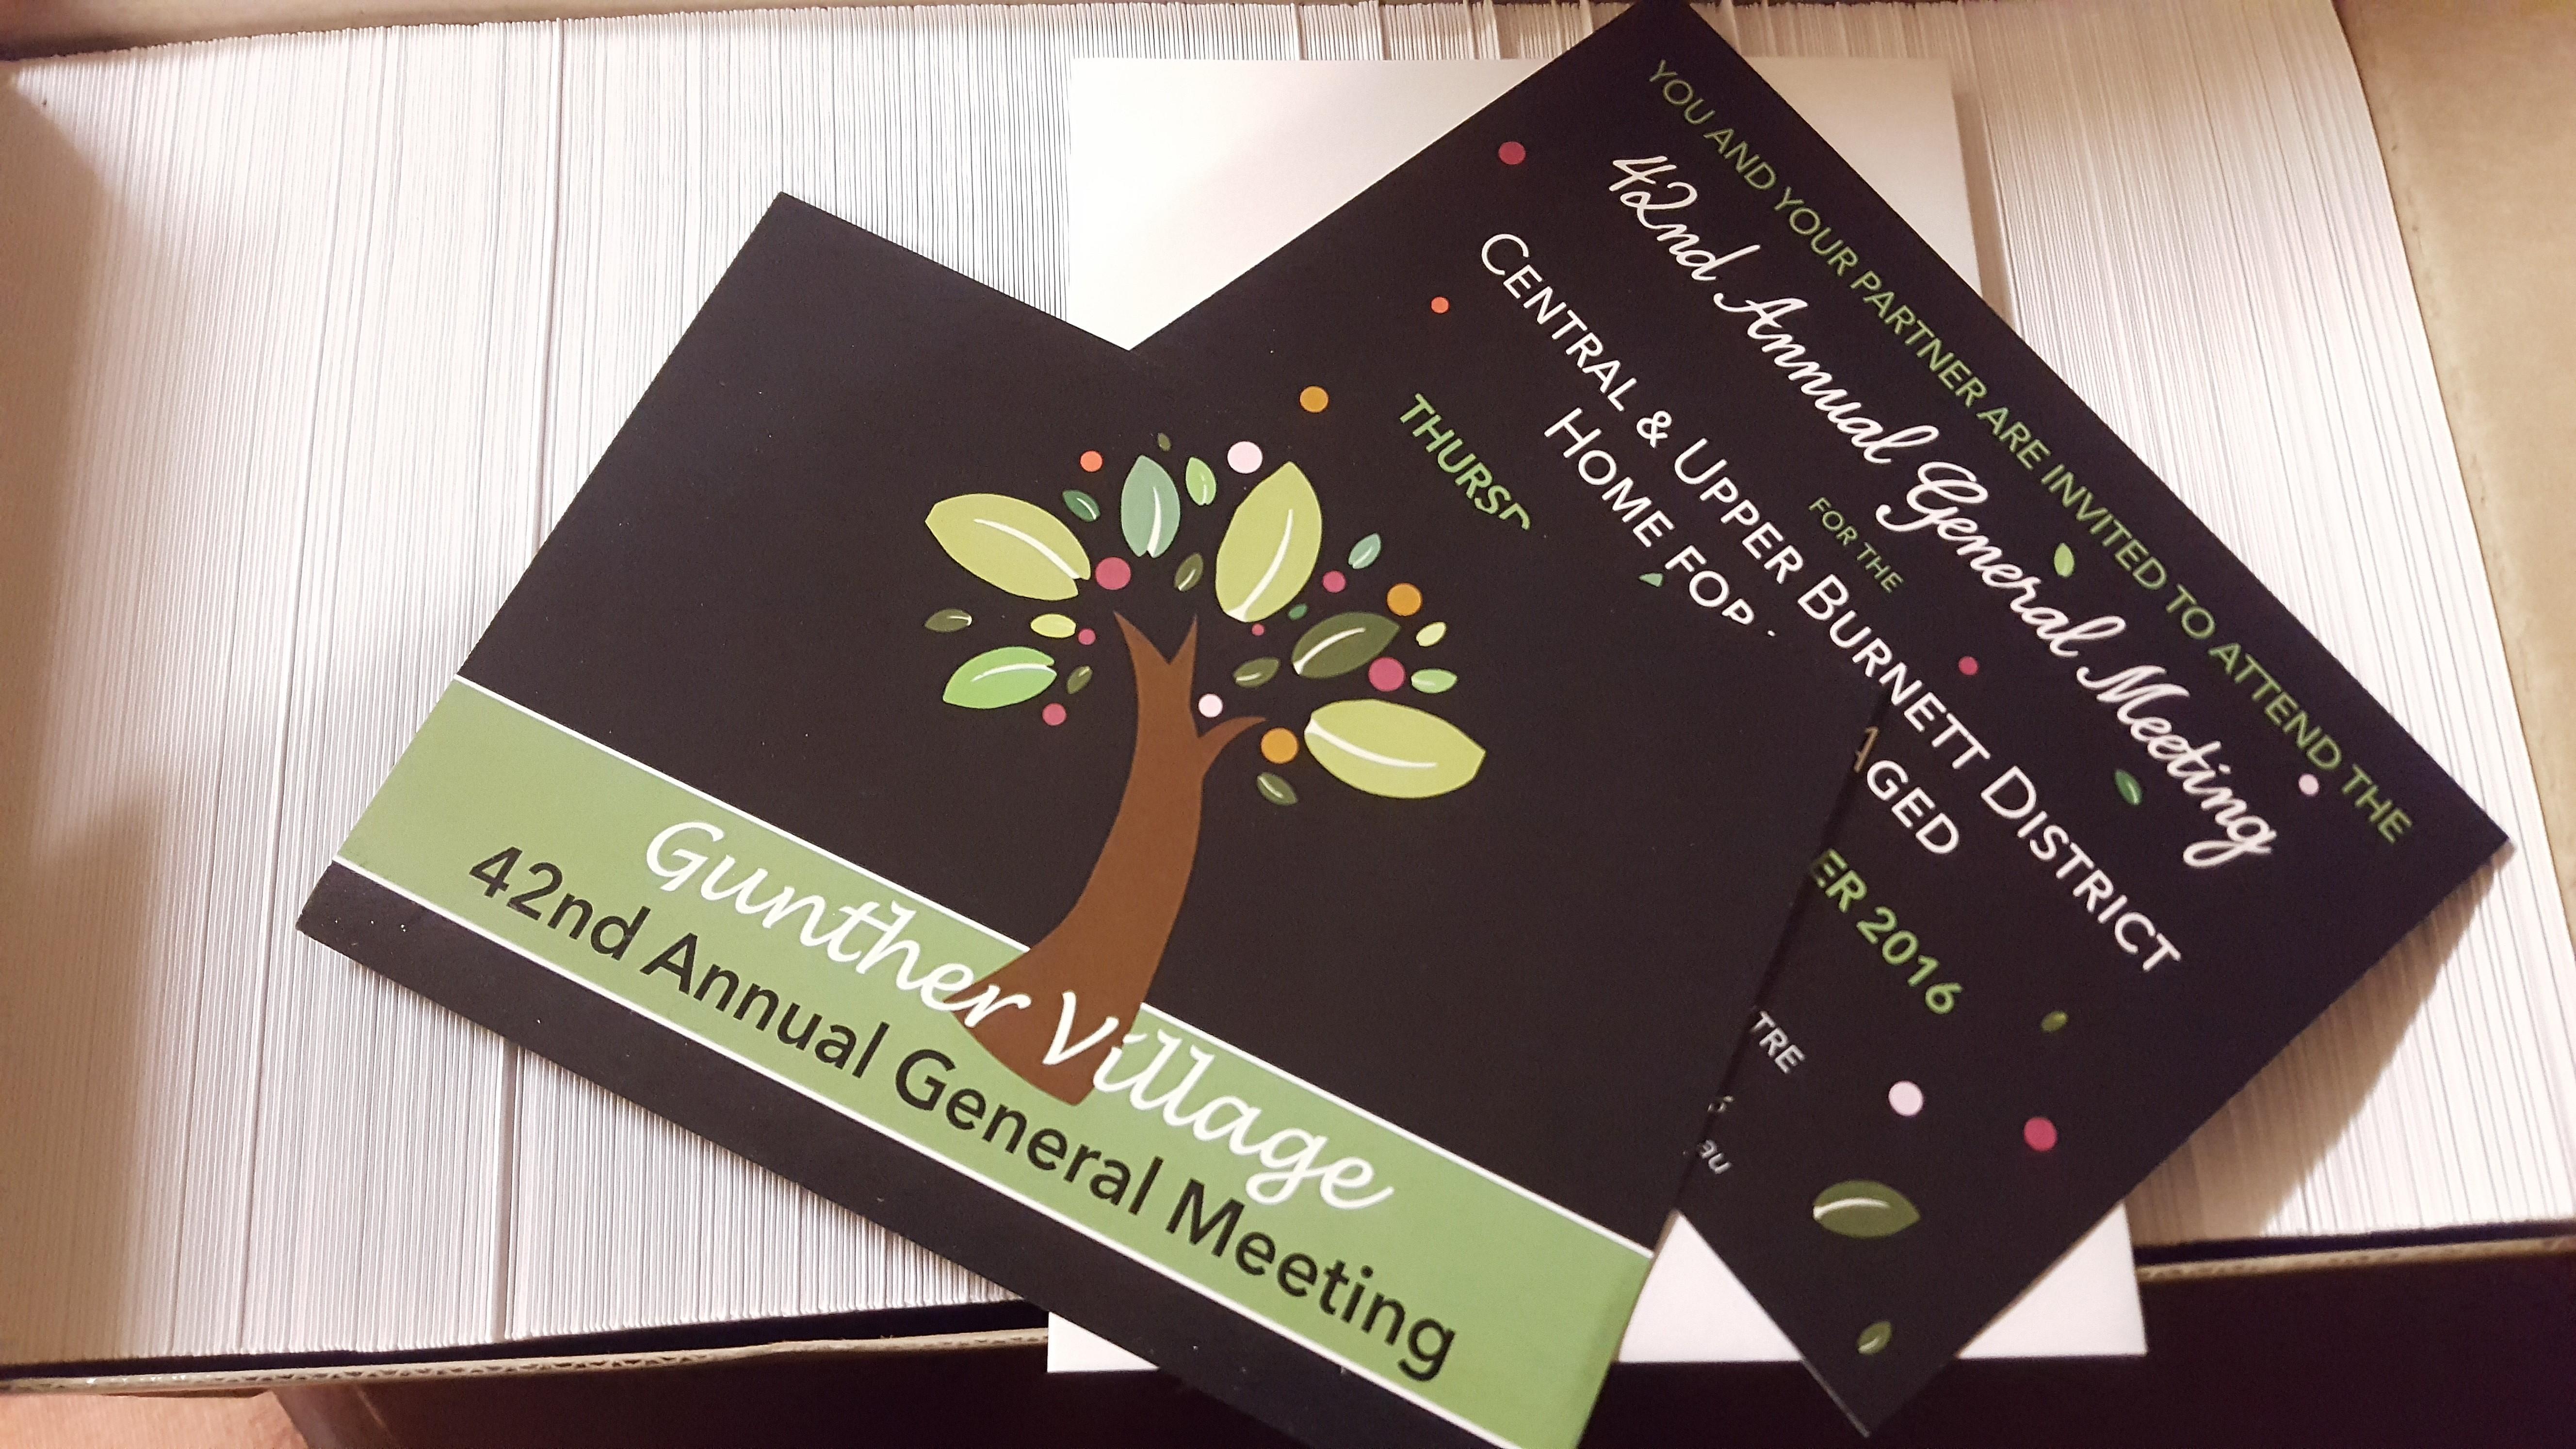 Gunther Village AGM Invites